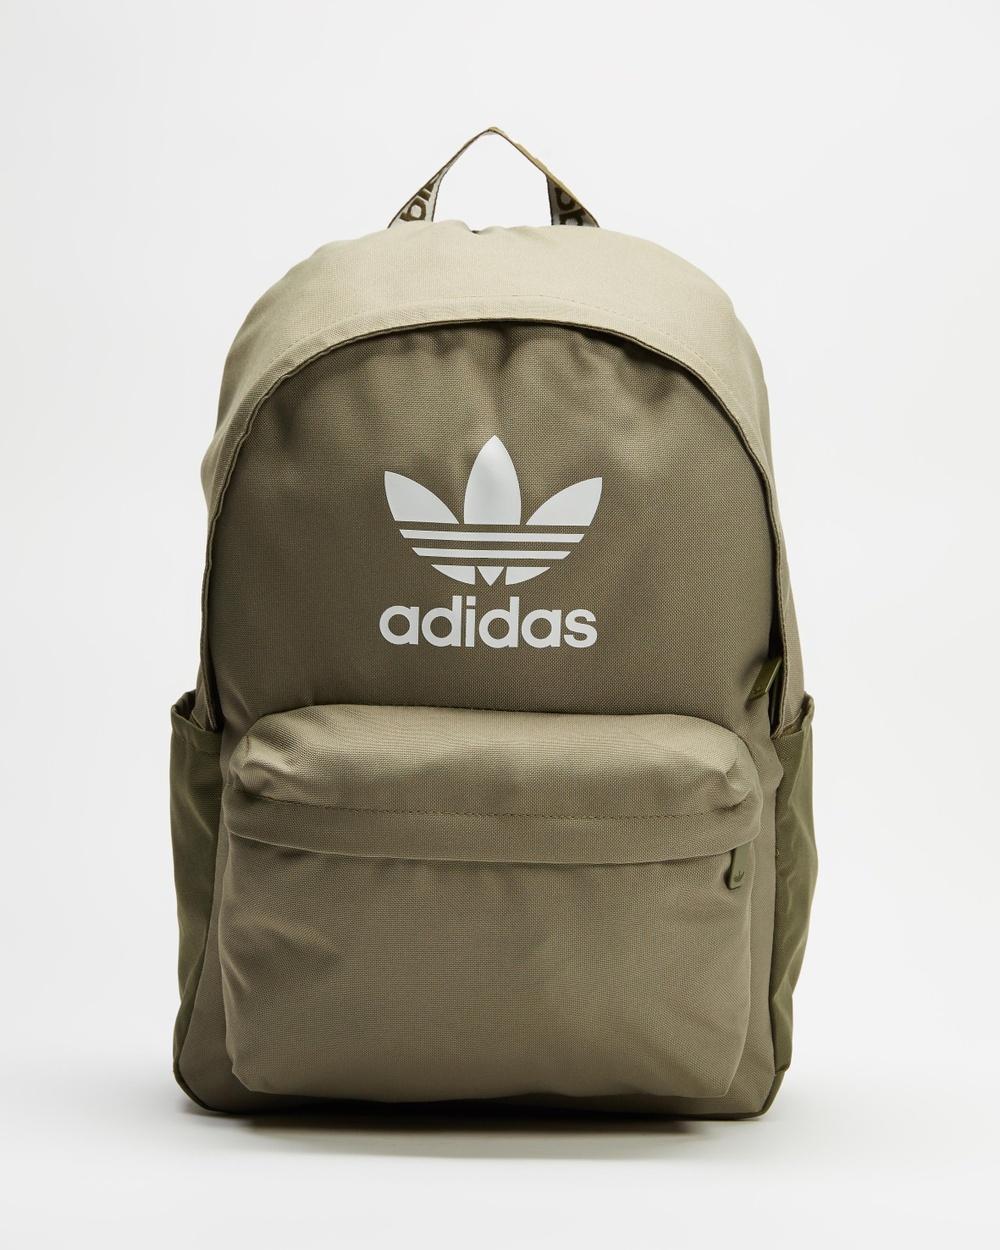 adidas Originals Adicolor Classic Backpack Backpacks Orbit Green, Focus Olive & White